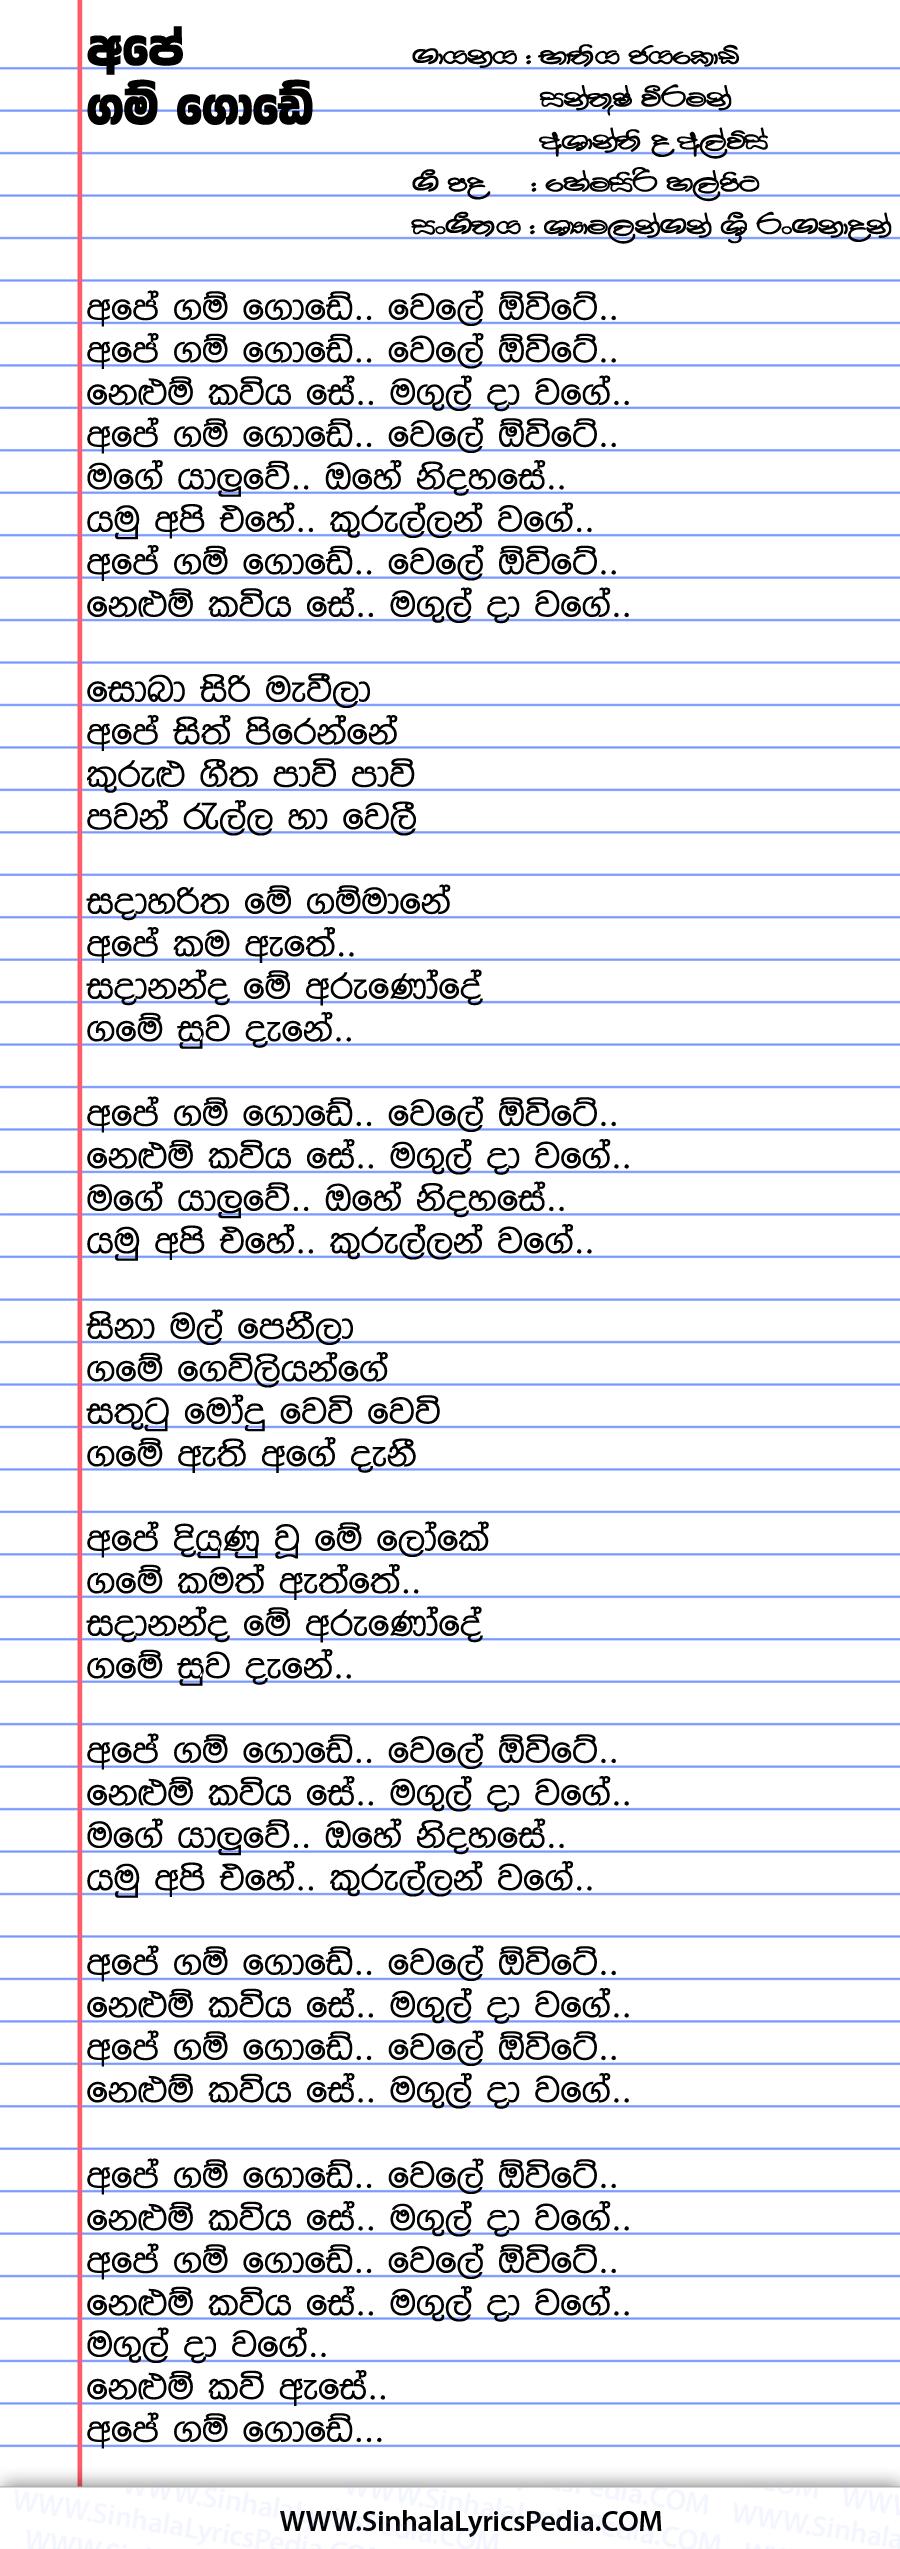 Ape Gam Gode Wele Owite Song Lyrics